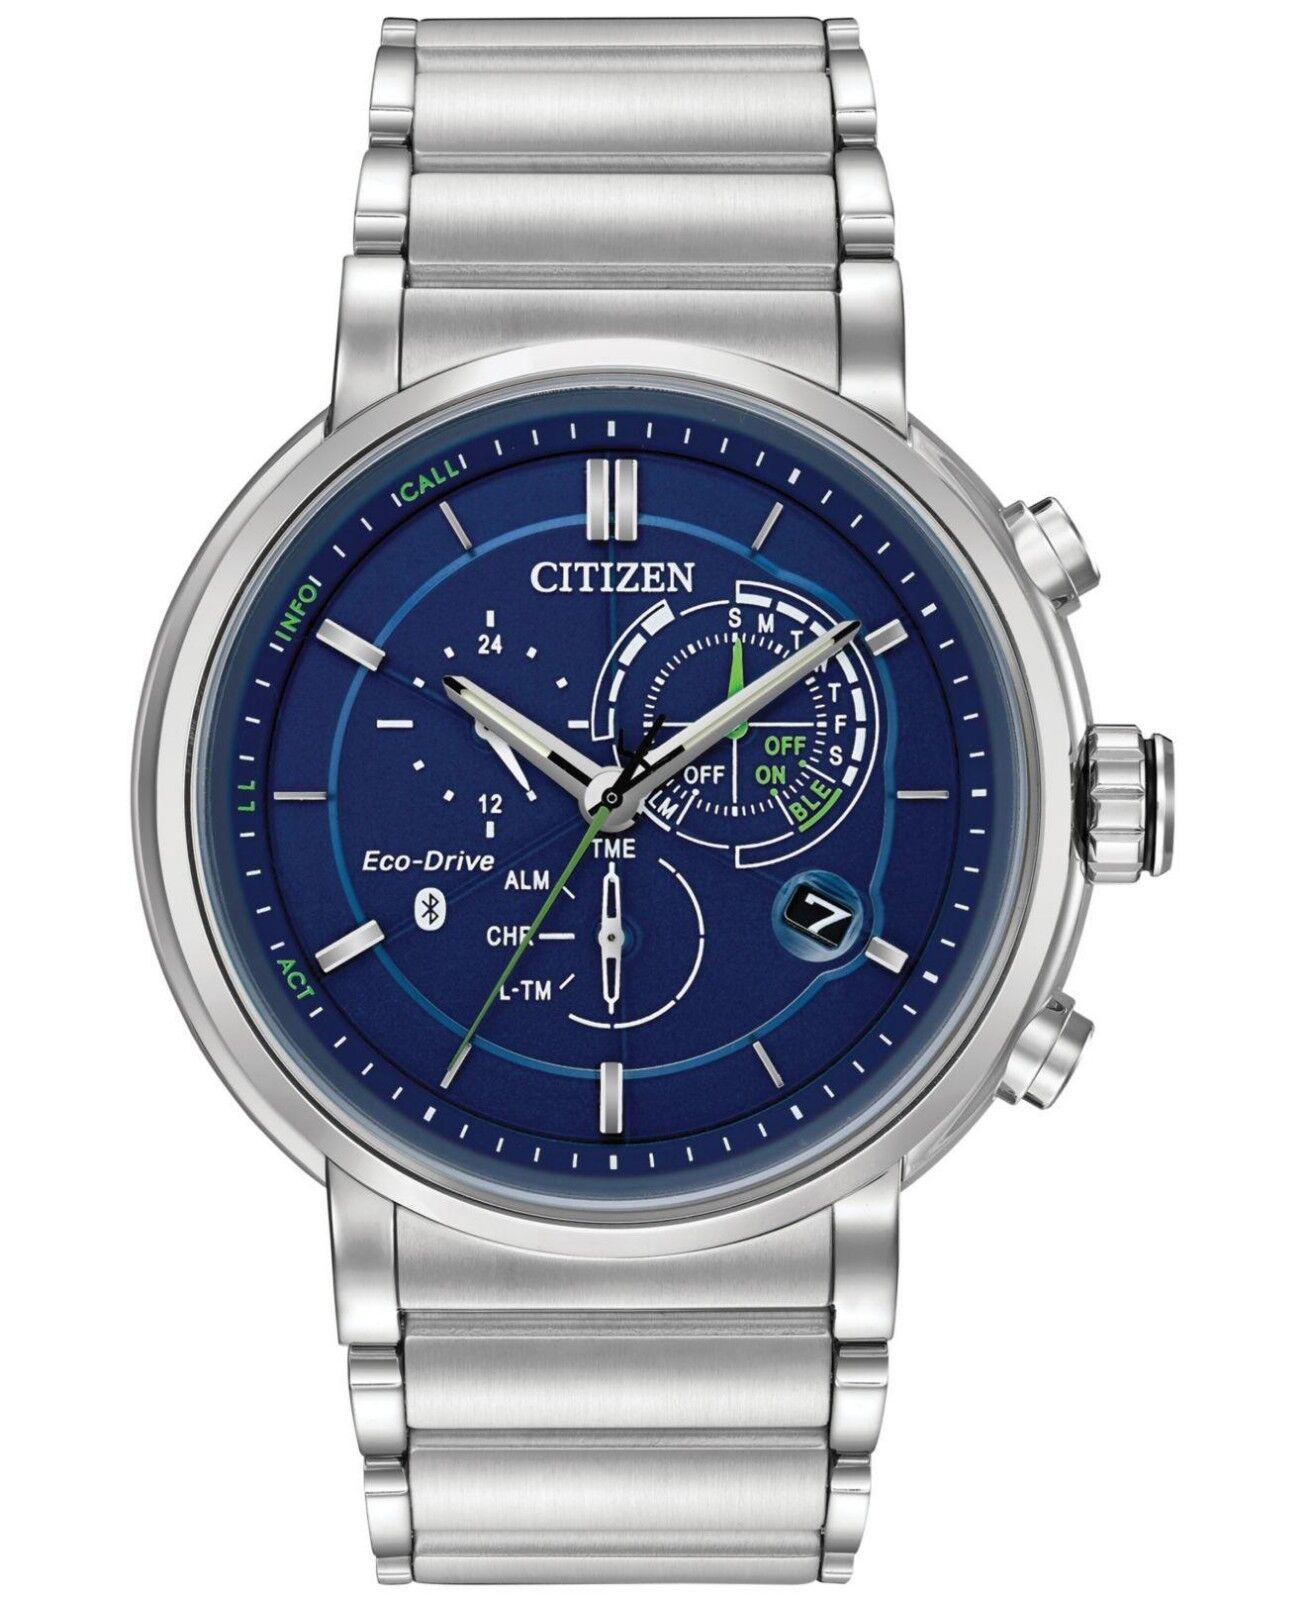 citizen-eco-drive-mens-proximity-chronograph-46mm-smart-watch-bz1000-54l